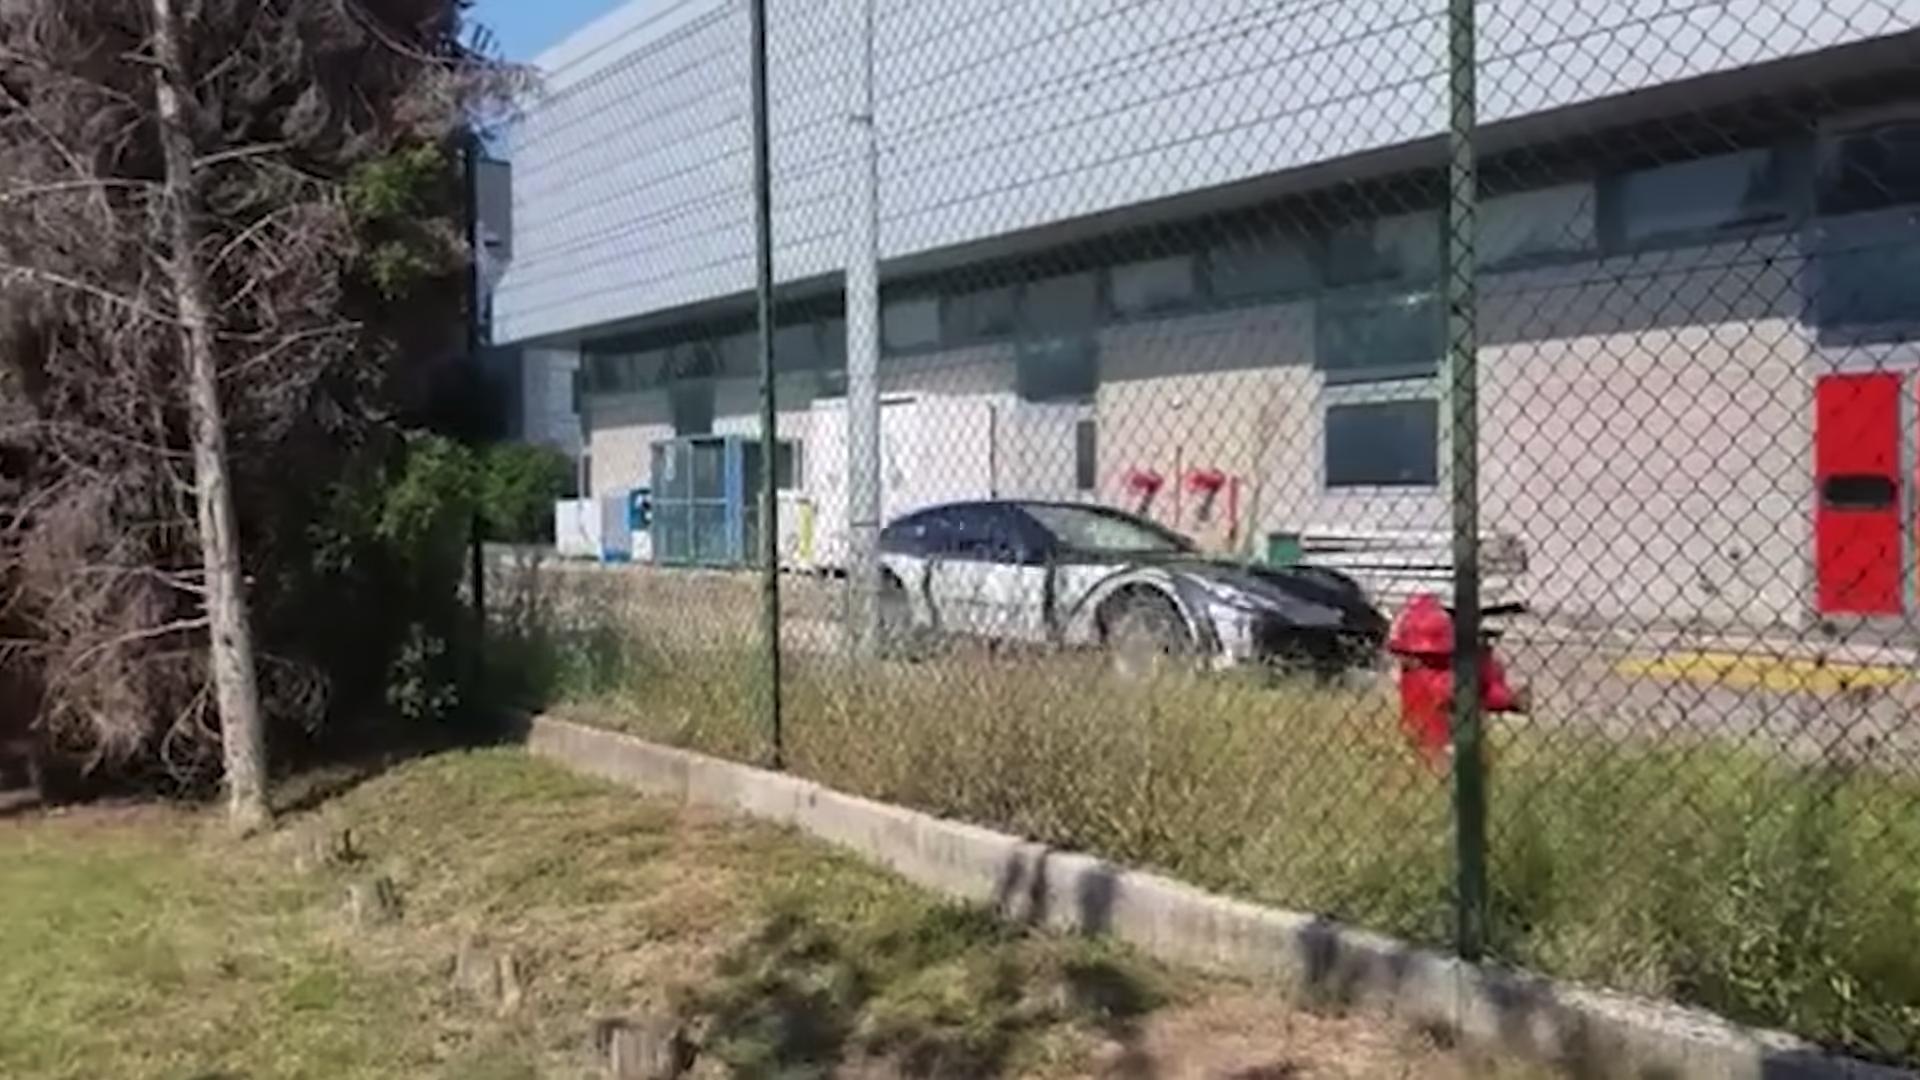 Ferrari Purosangue SUV Prototype Caught on Video